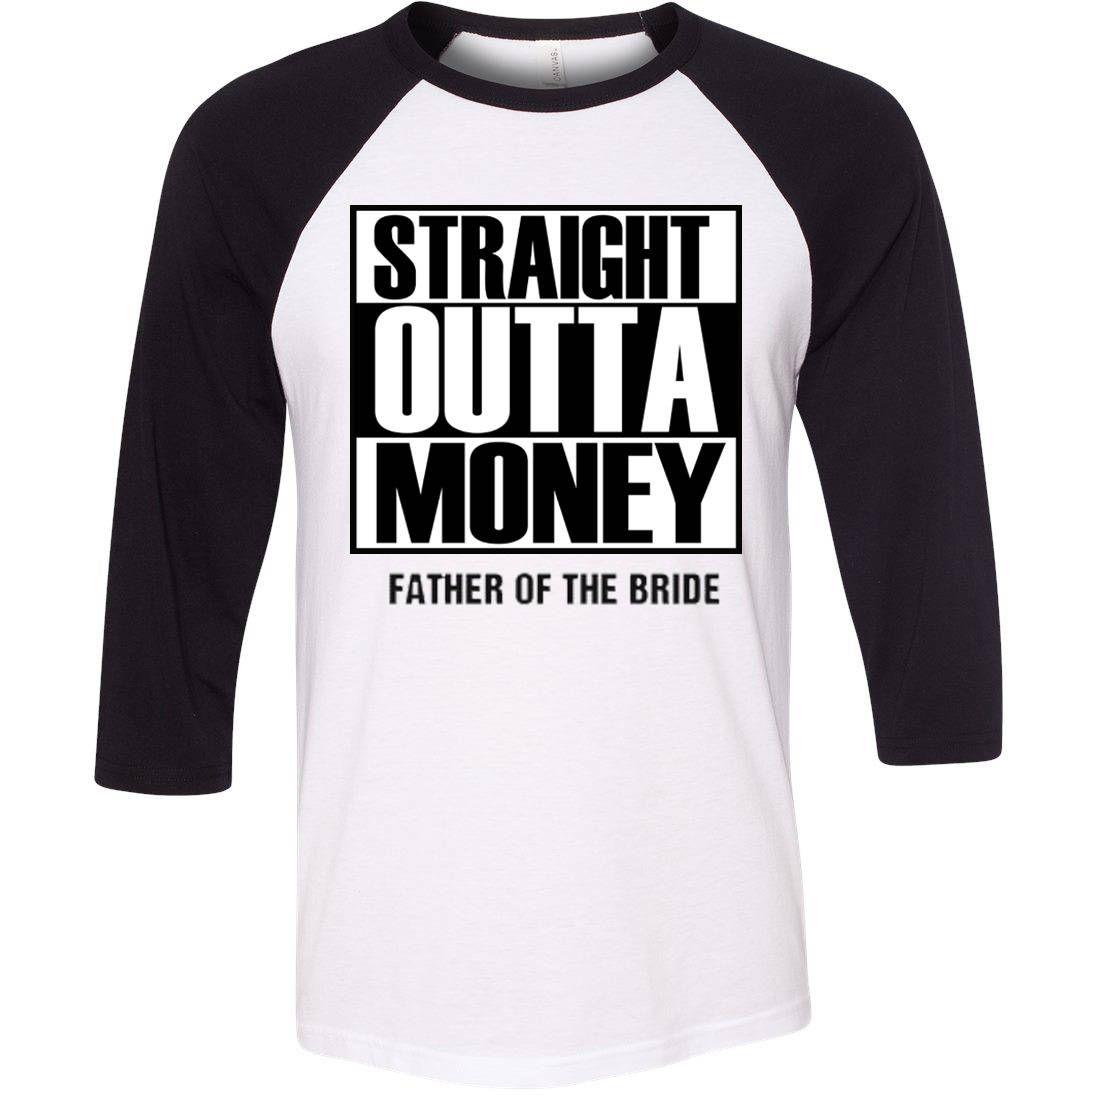 7a23ea00 Straight Outta Money Father of the Bride Shirt, Father of the Bride, Bridal  Party Tshirt, Wedding Gift, Bridal Party gift, Fathers Gift, ...